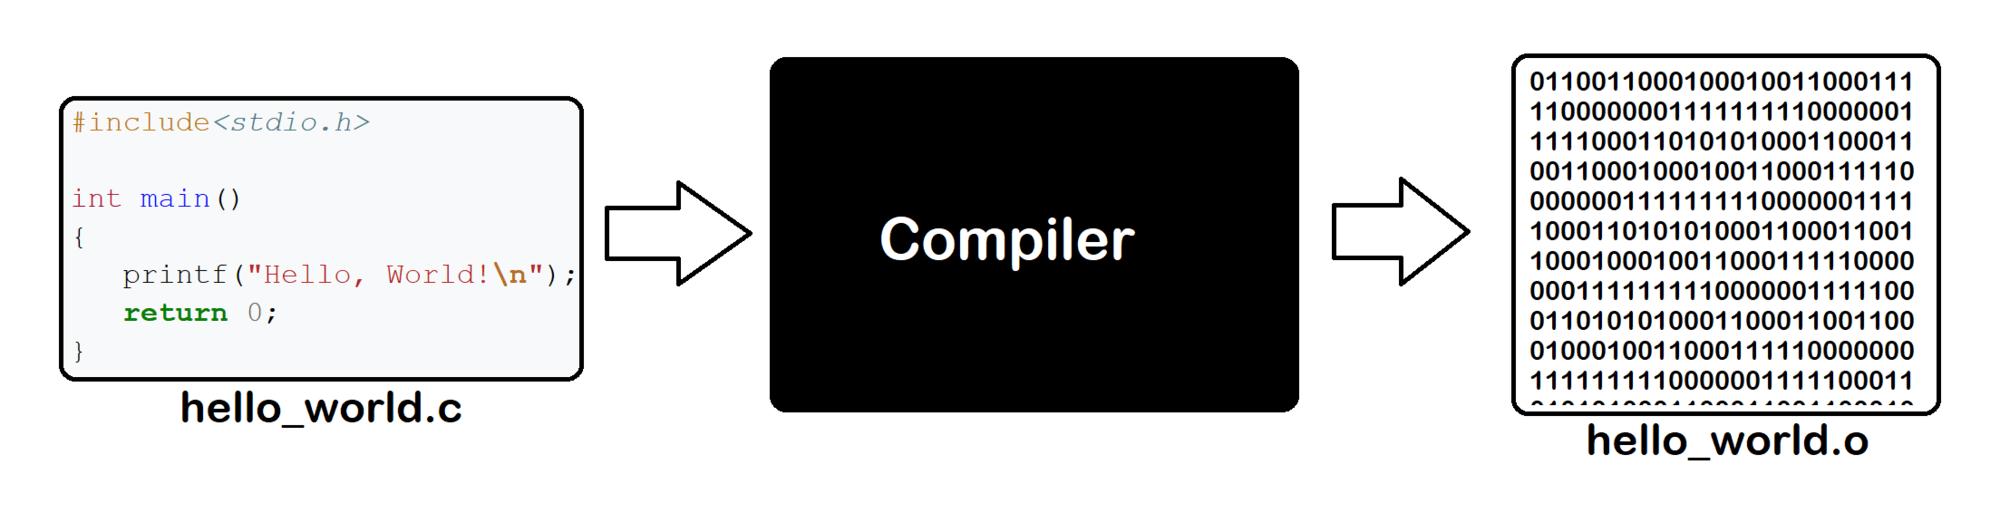 کامپایلرها چگونه کار میکنند؟